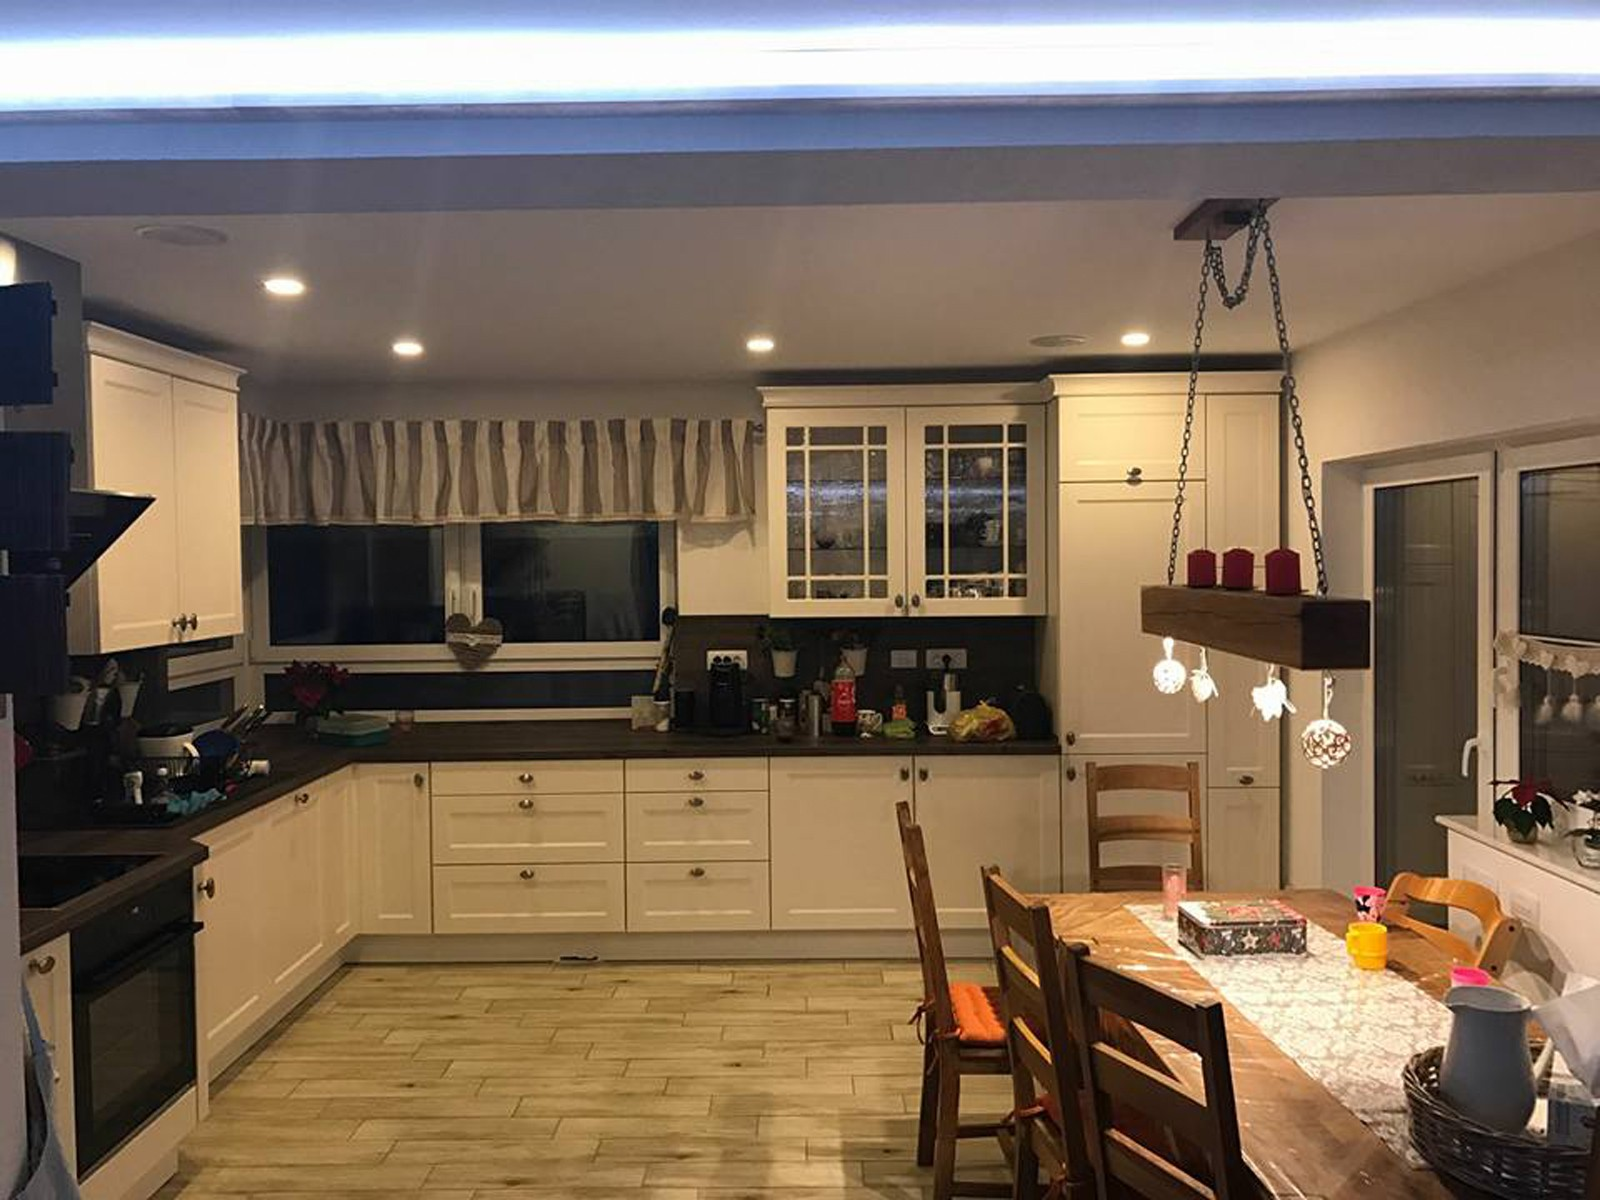 Referință - Bucătărie rustică Nobilia Chalet - Crem, bej / Stejar stem